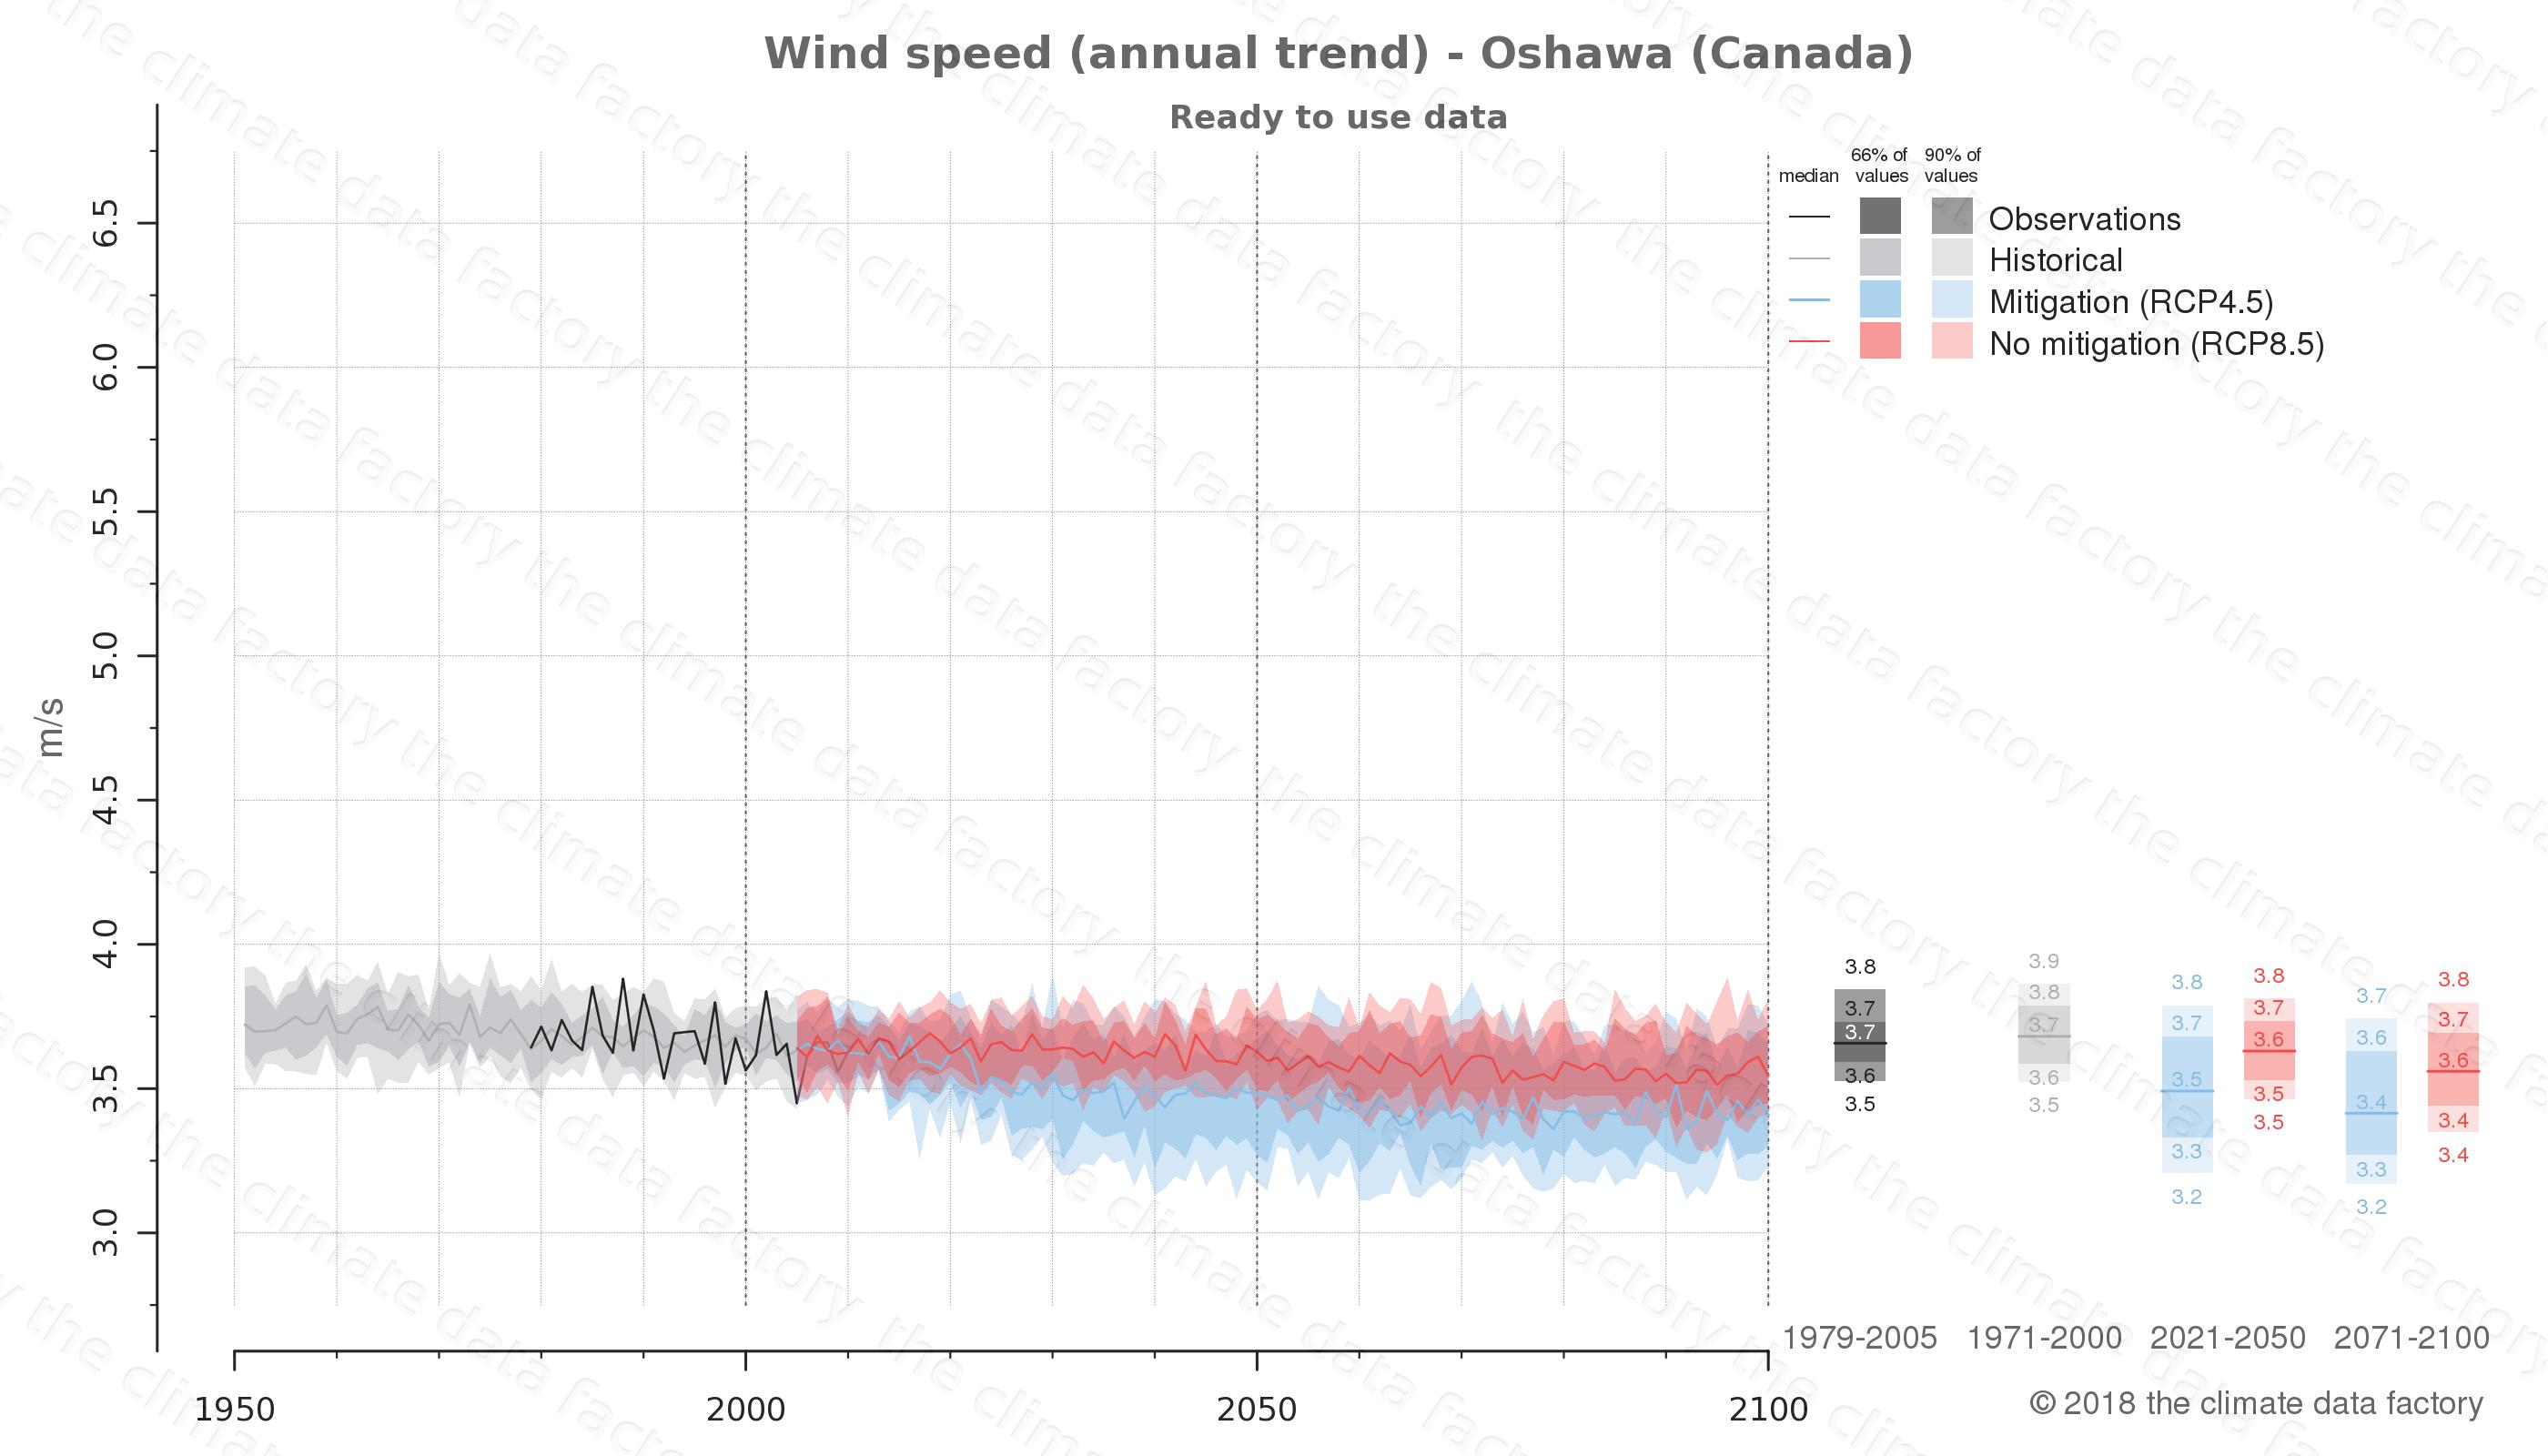 climate change data policy adaptation climate graph city data wind-speed oshawa canada